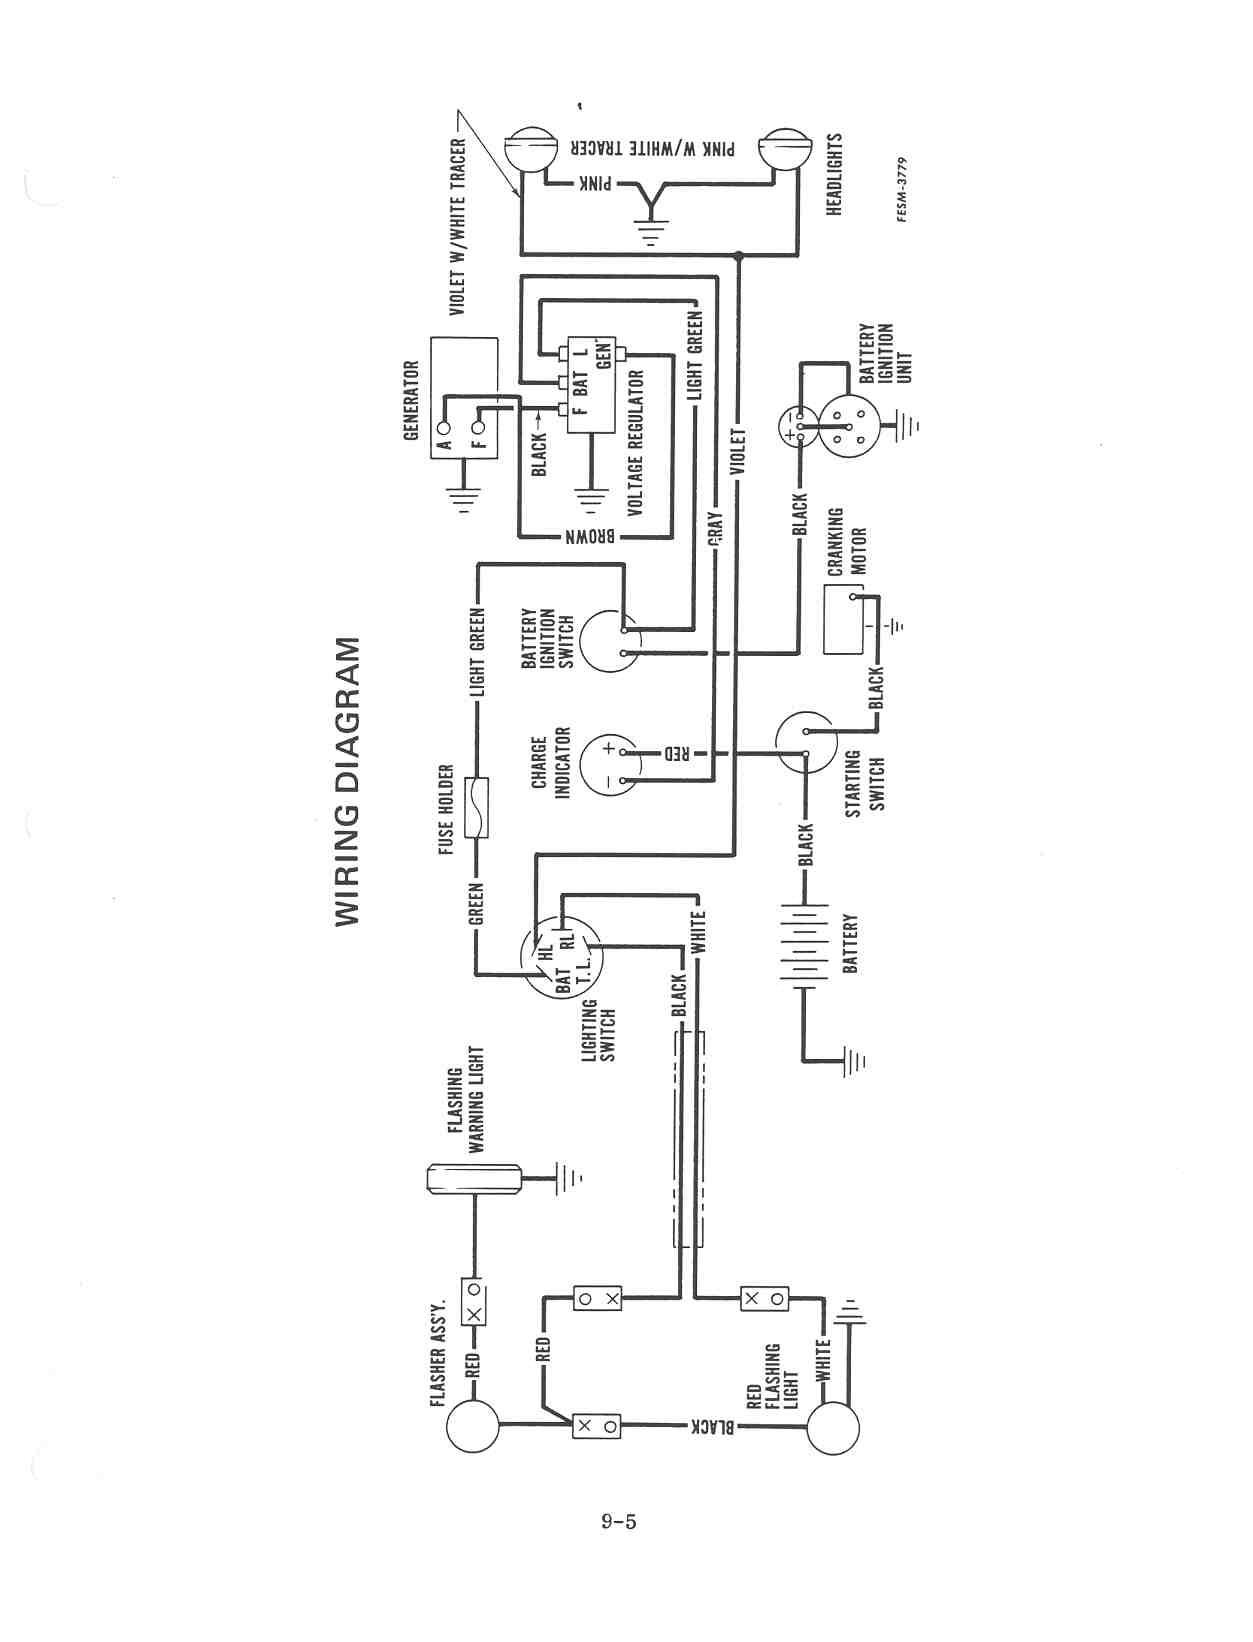 154 Cub Cadet Wiring Diagram - Wiring Diagram Features